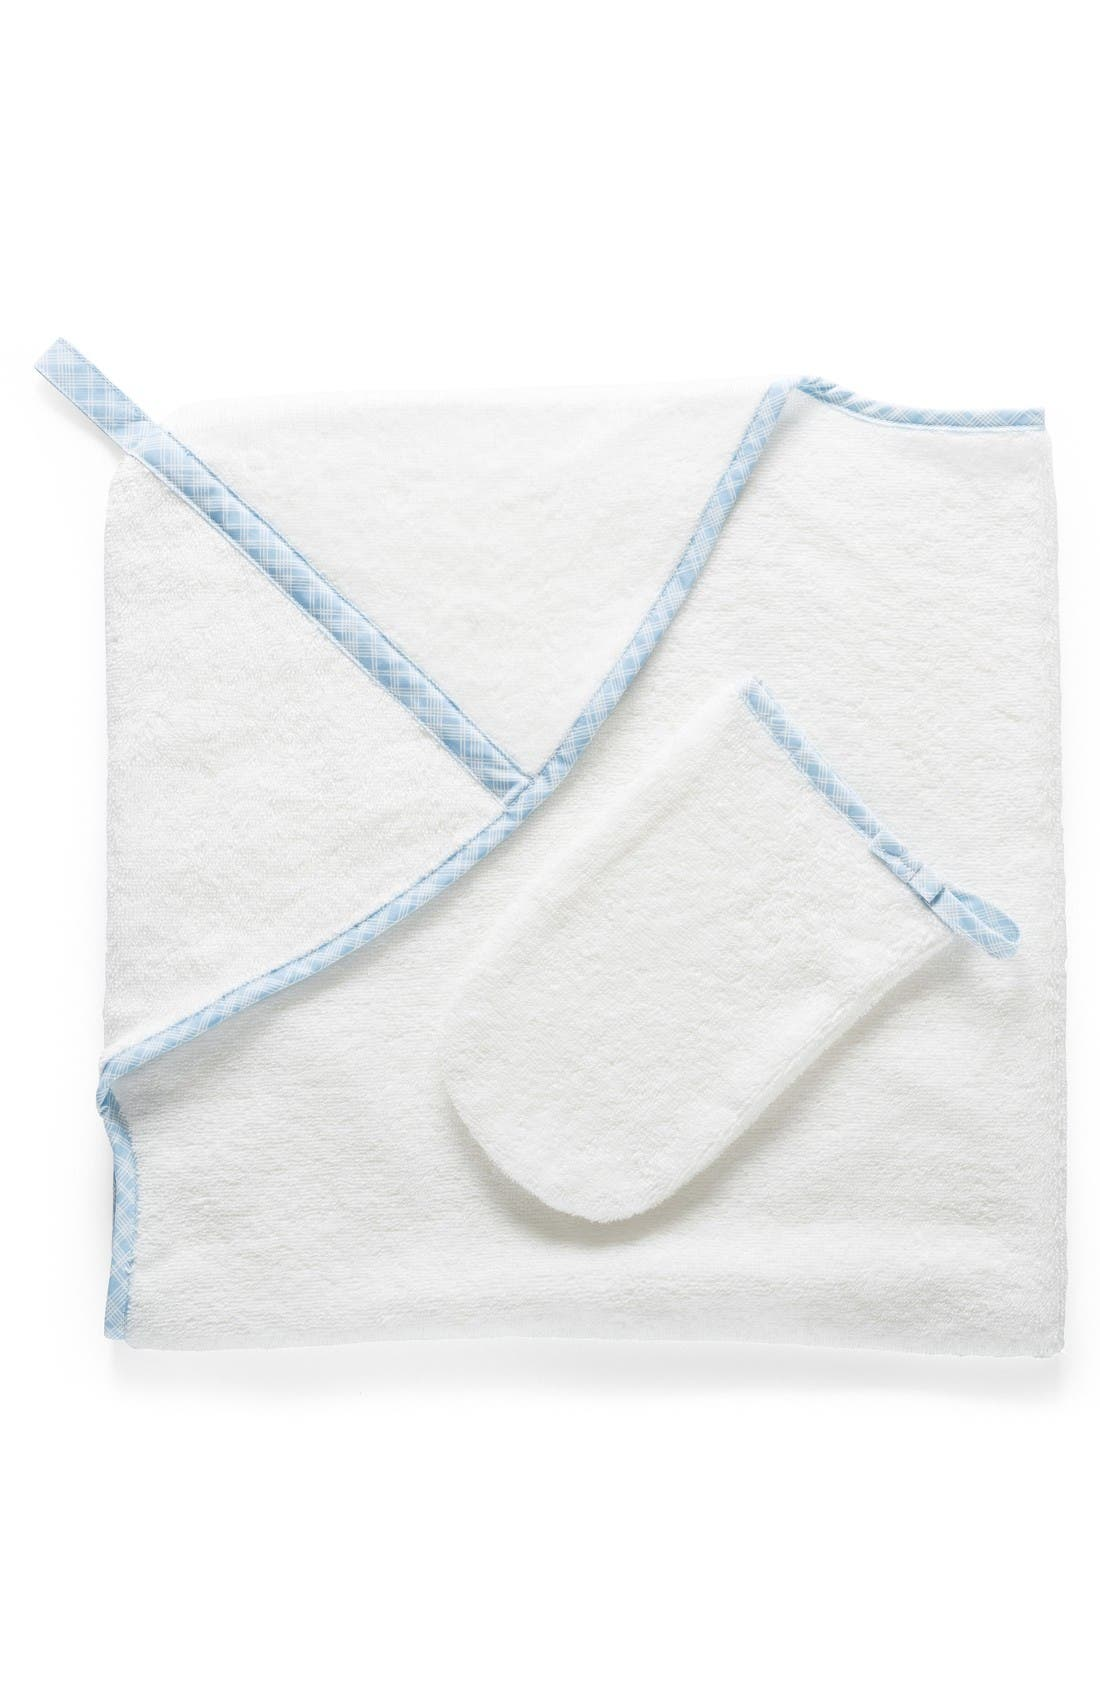 Hooded Towel & Bath Mitt Set,                             Main thumbnail 1, color,                             Blue Checks